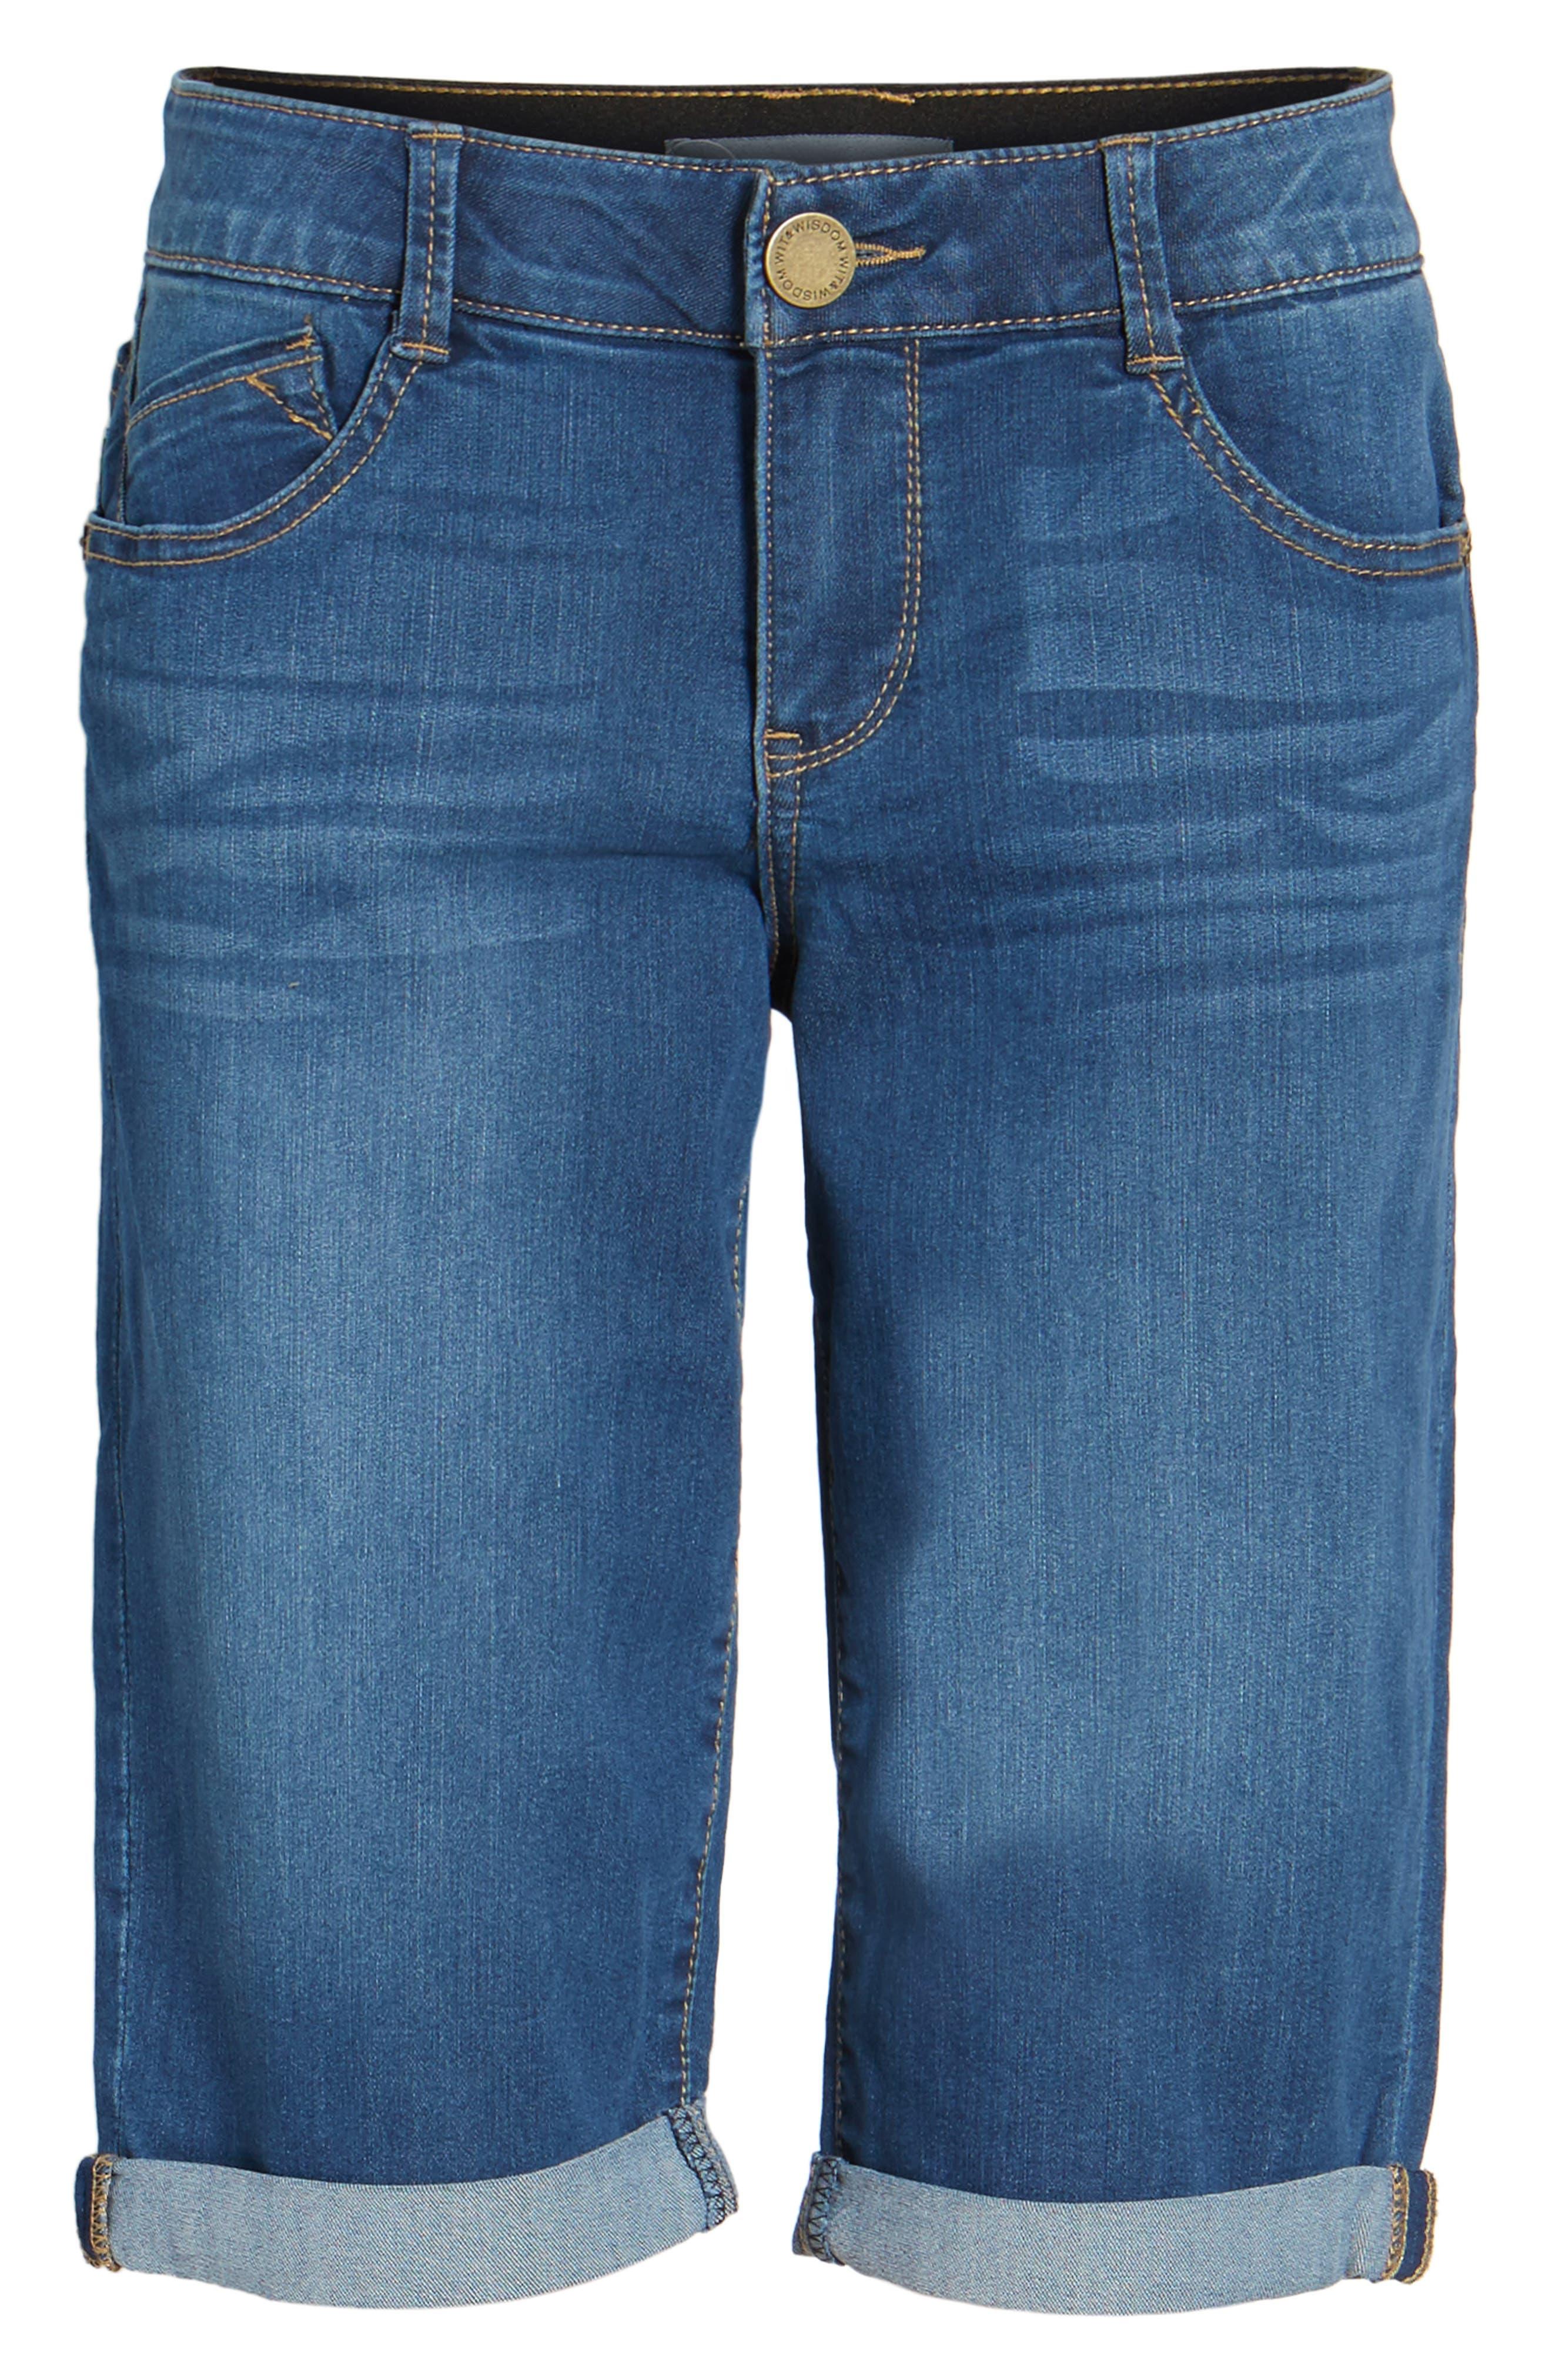 Ab-solution Denim Bermuda Shorts,                             Alternate thumbnail 6, color,                             420